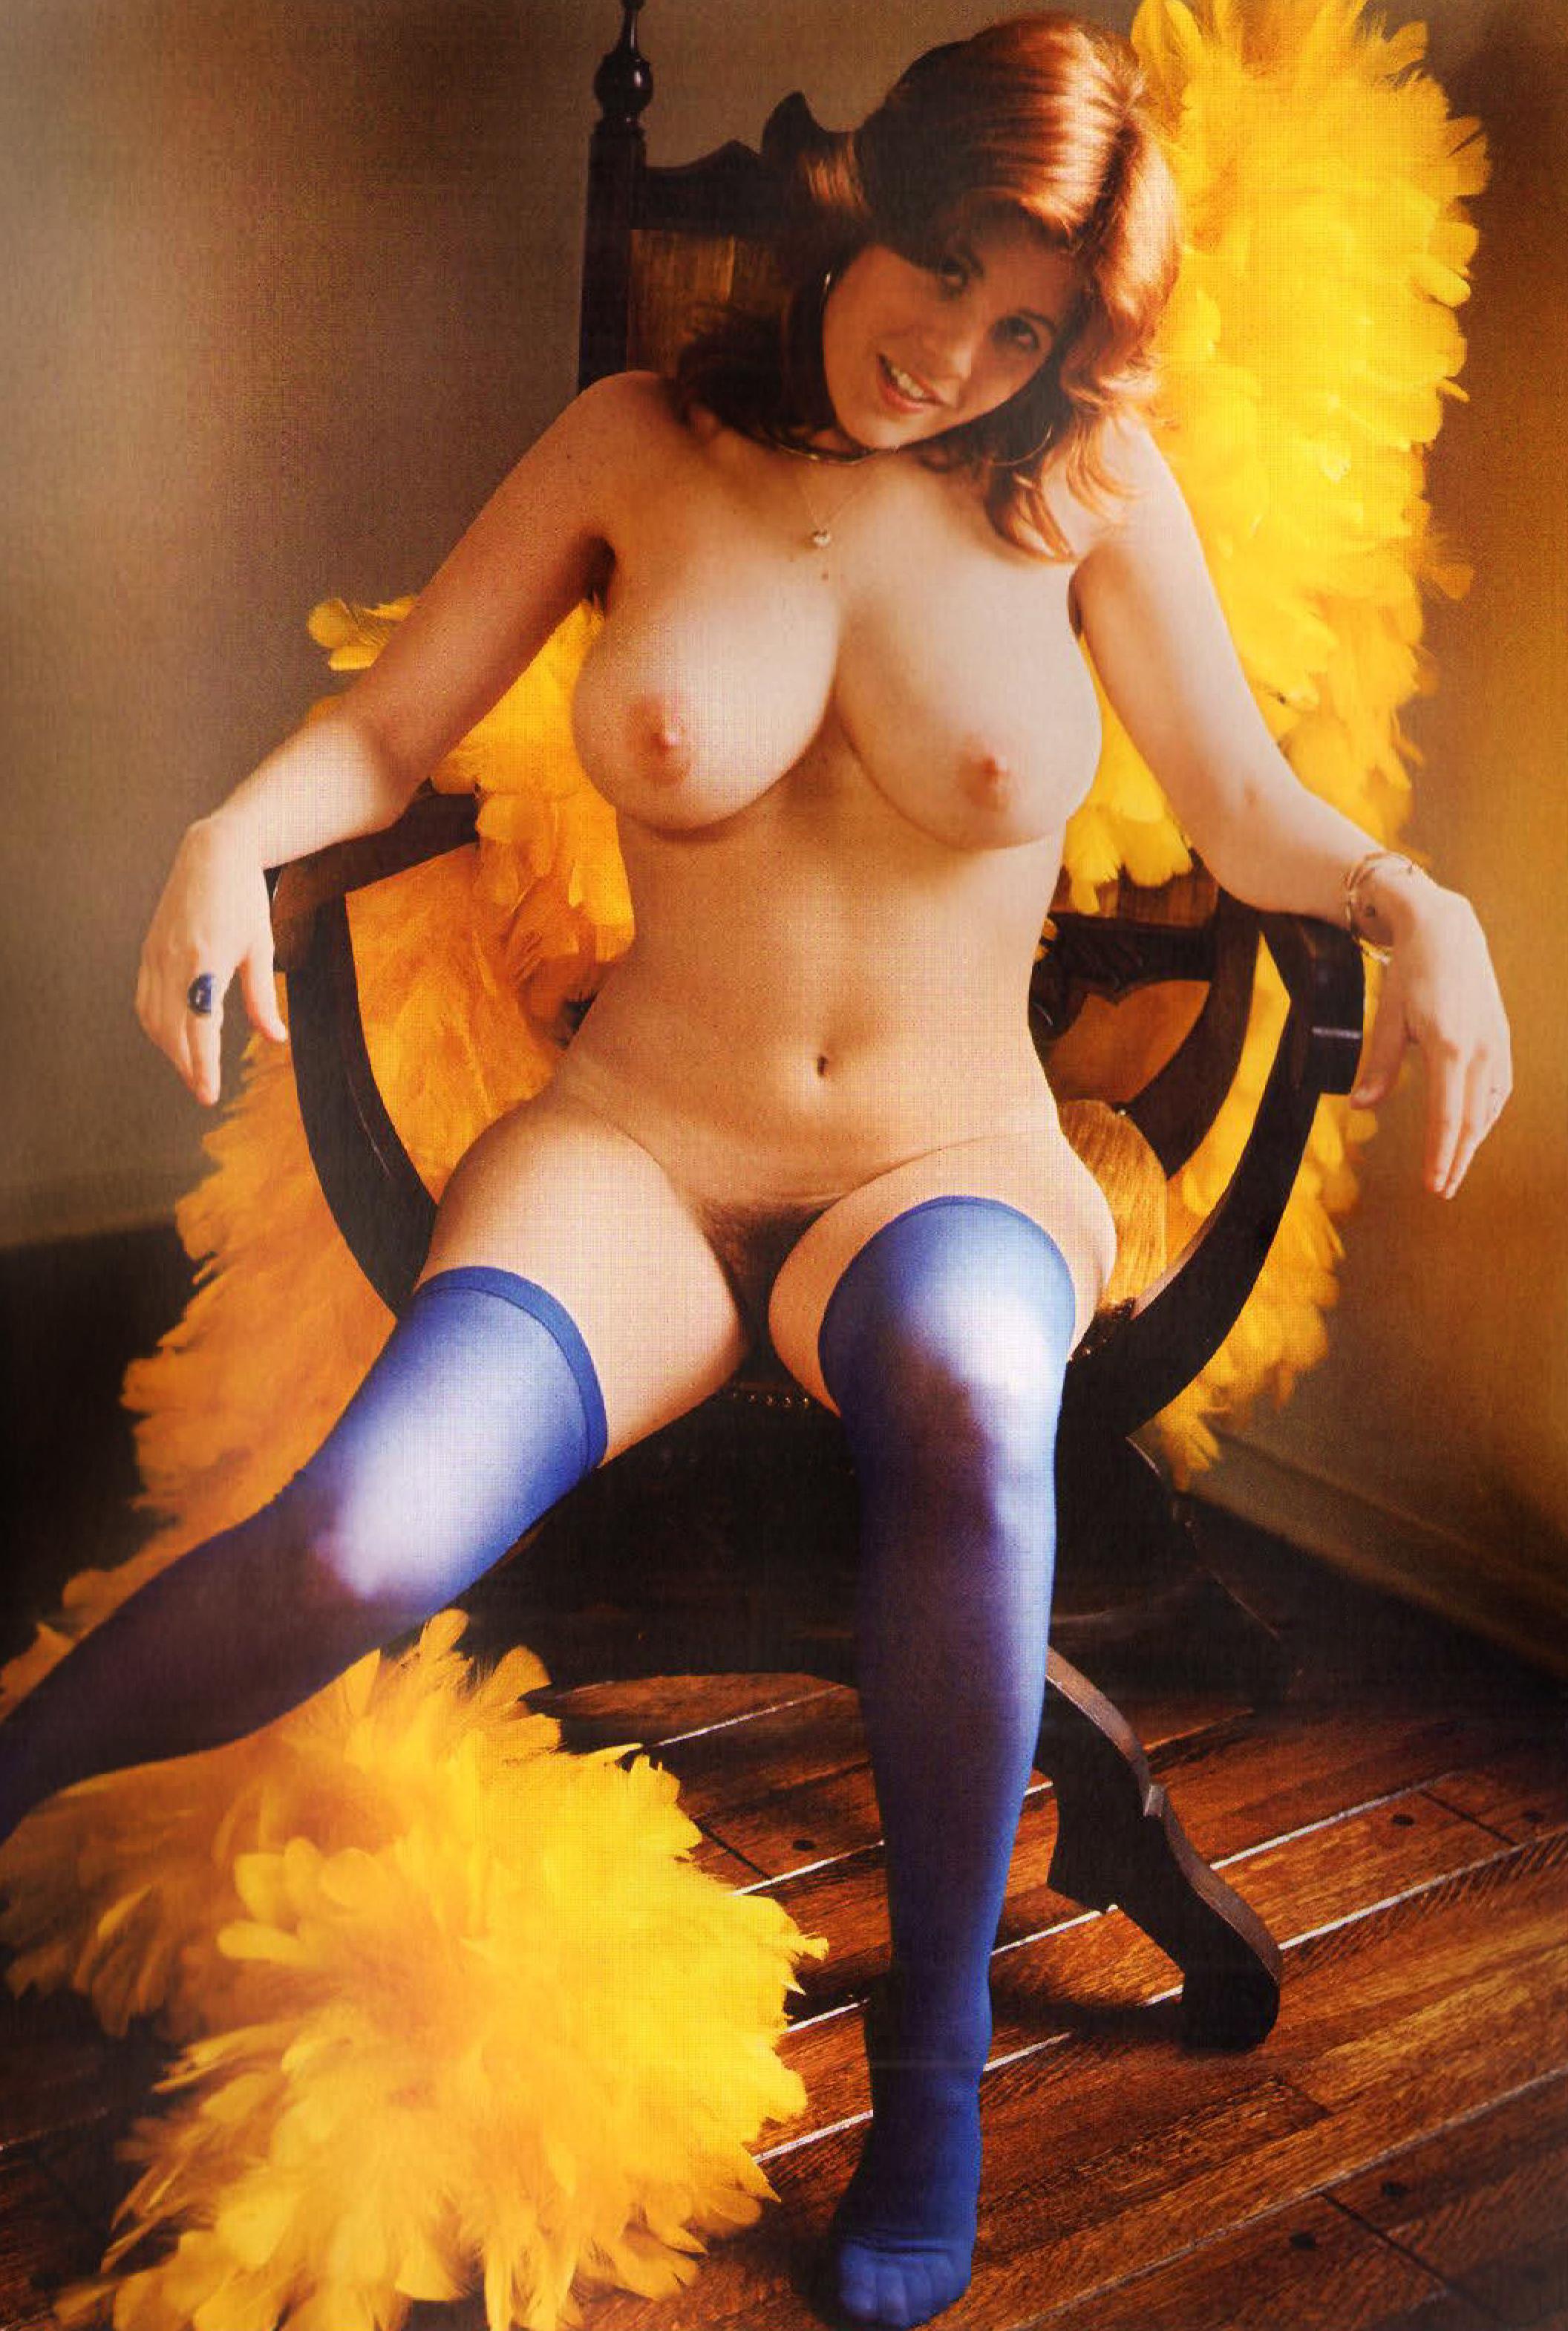 03 Gail Silverton Taschen's Big Book of Breasts 2006 b.jpg